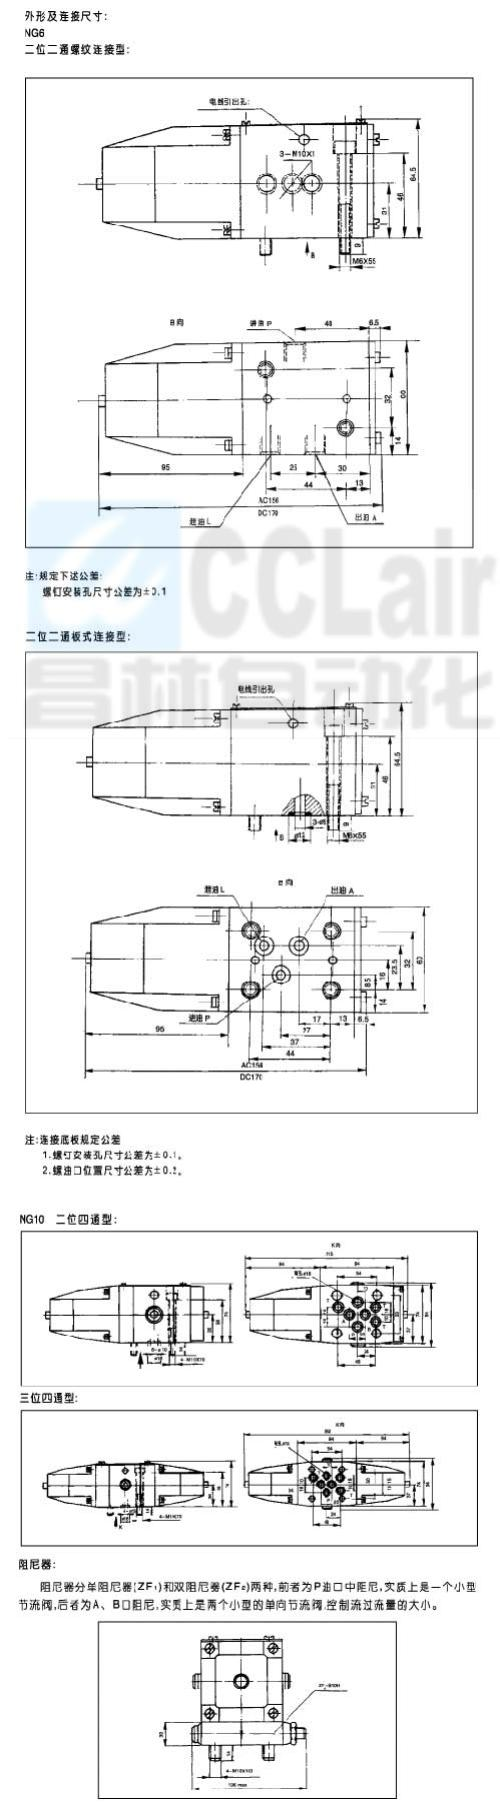 24bi1-b10h-t 24bi2-b10h-t 24bi3-b10h -t 电磁换向阀图片